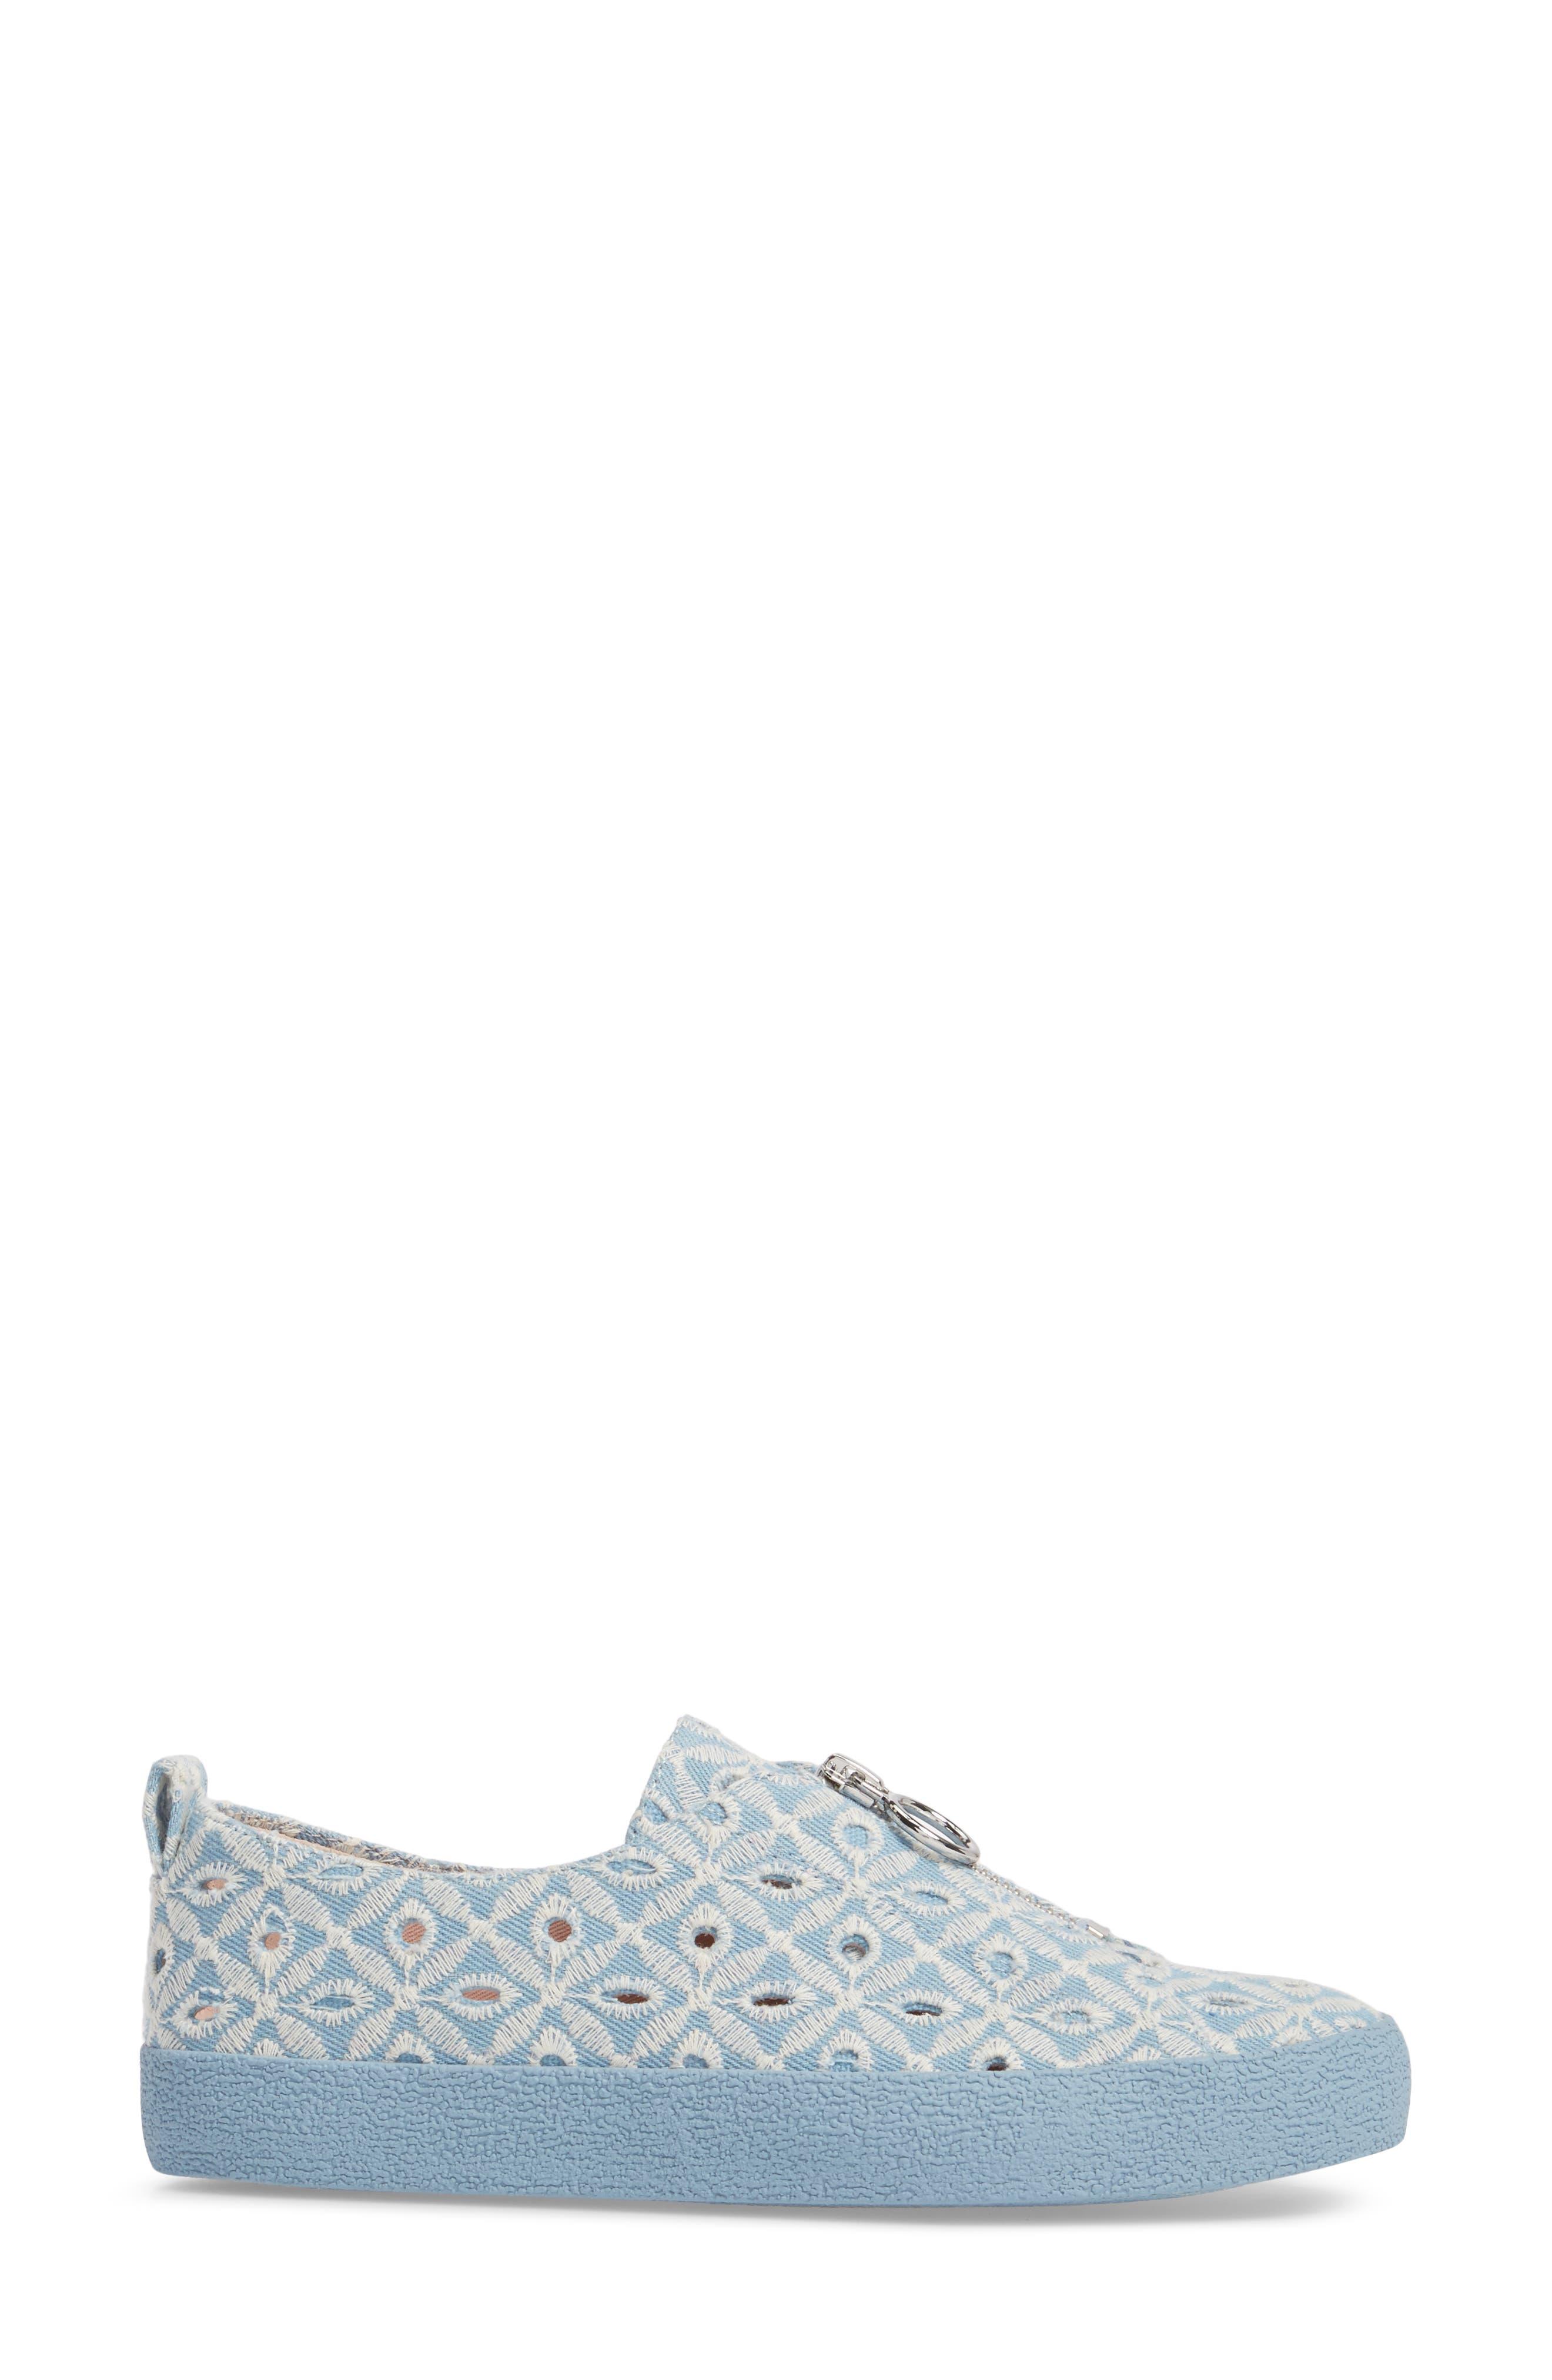 Sasha Zip Sneaker,                             Alternate thumbnail 8, color,